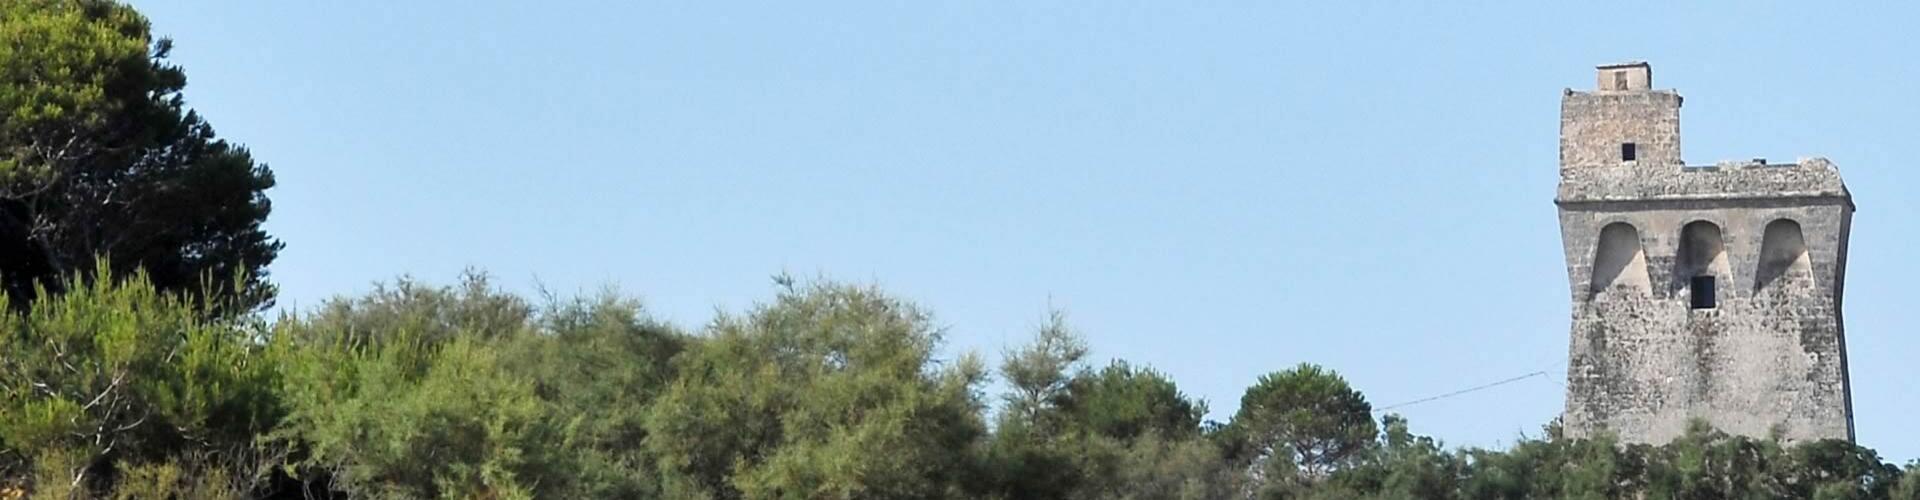 lavecchiatorregallipoli en la-vecchia-torre-history 008